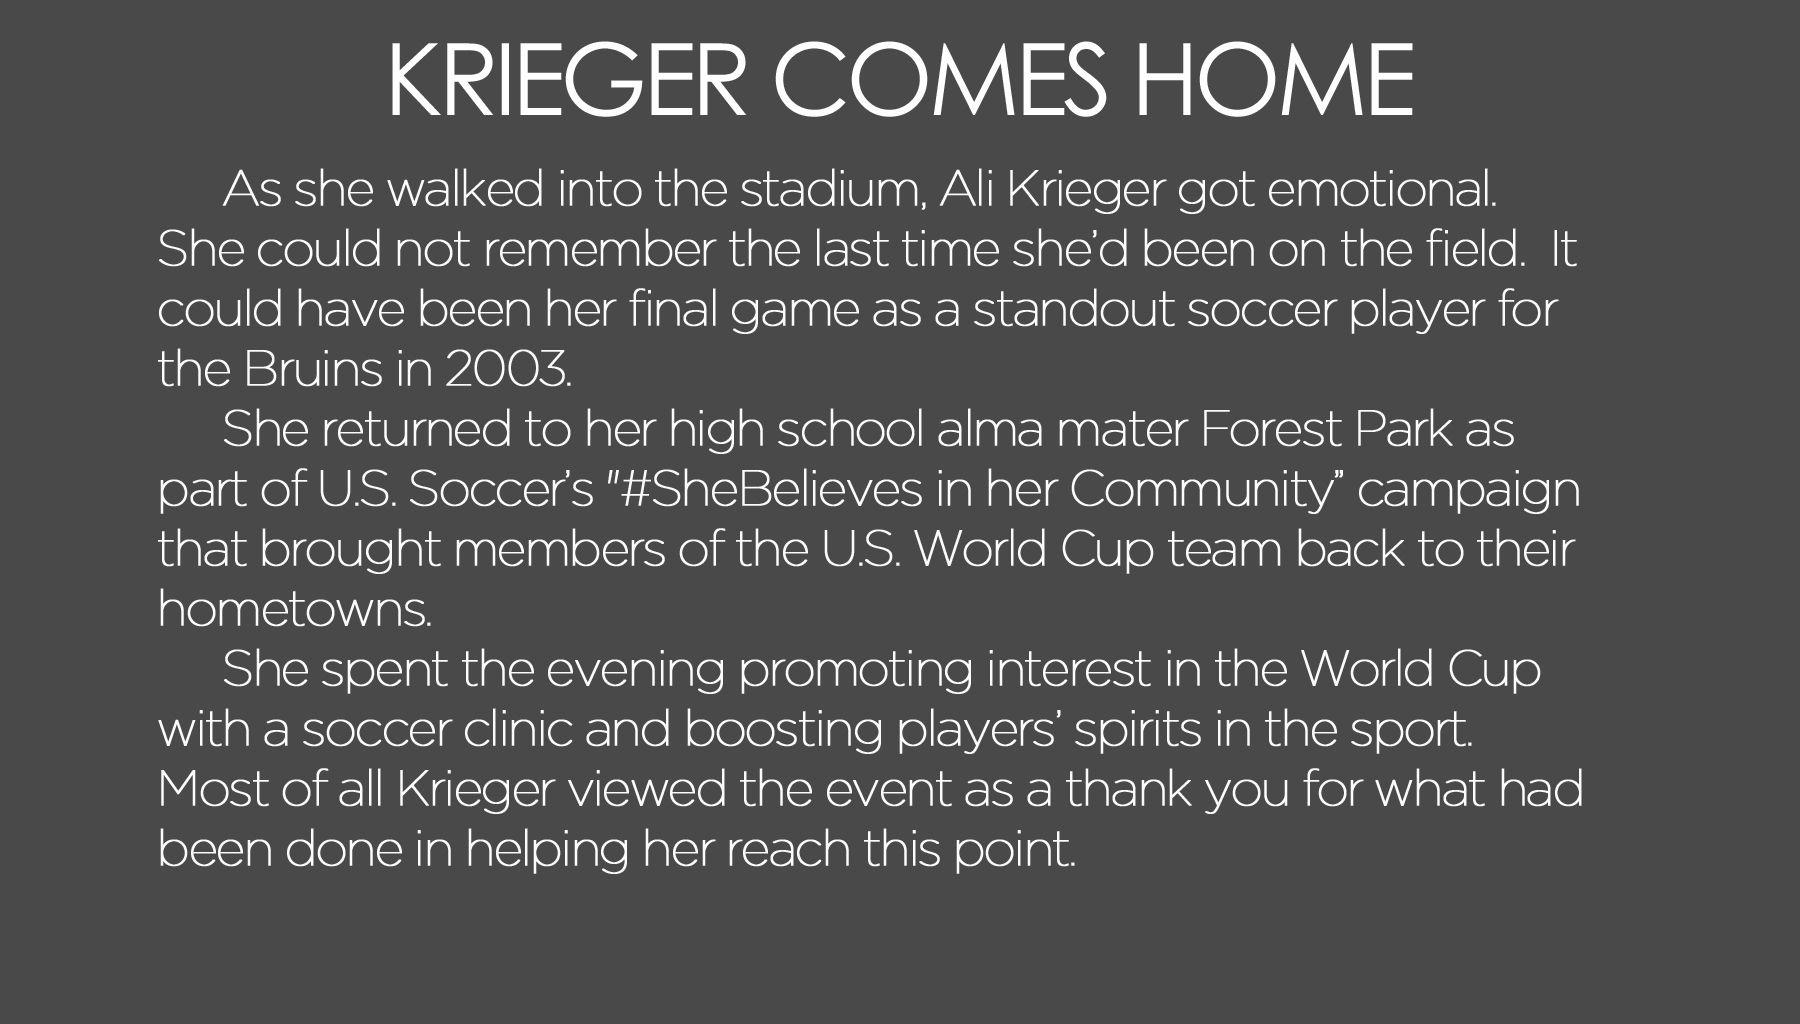 1krieger_comes_home